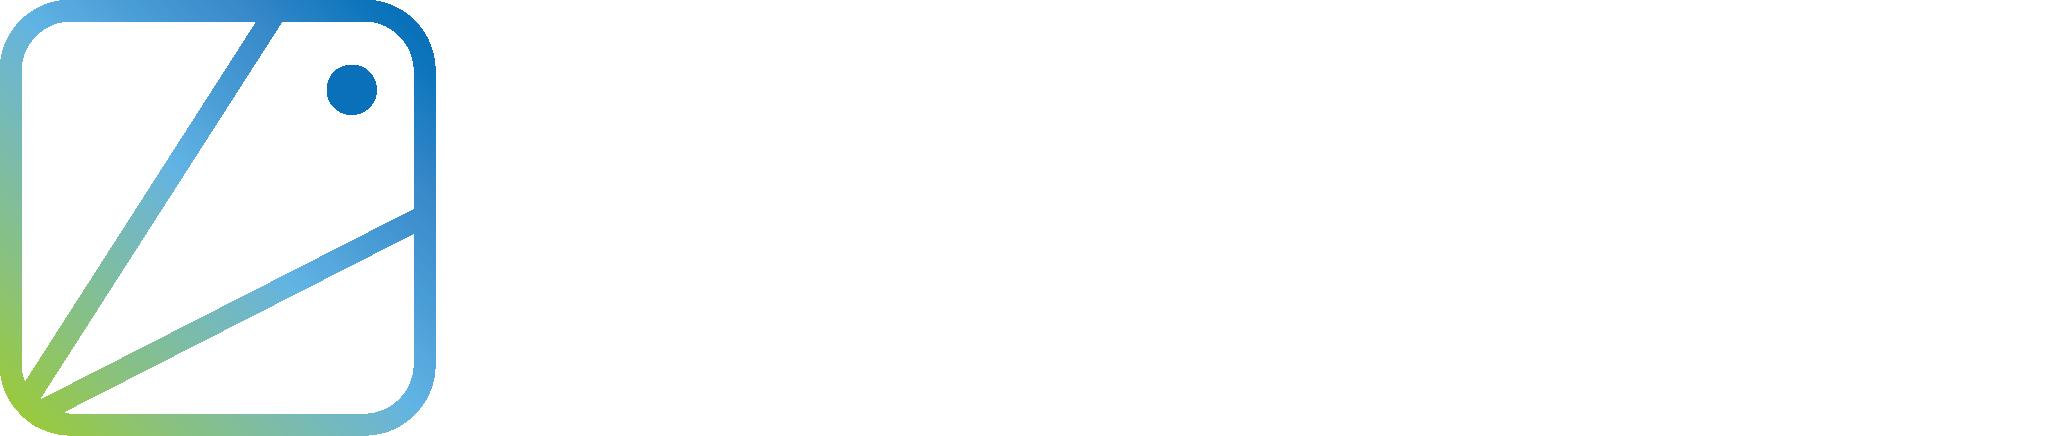 robin-new-logo-dark-bg